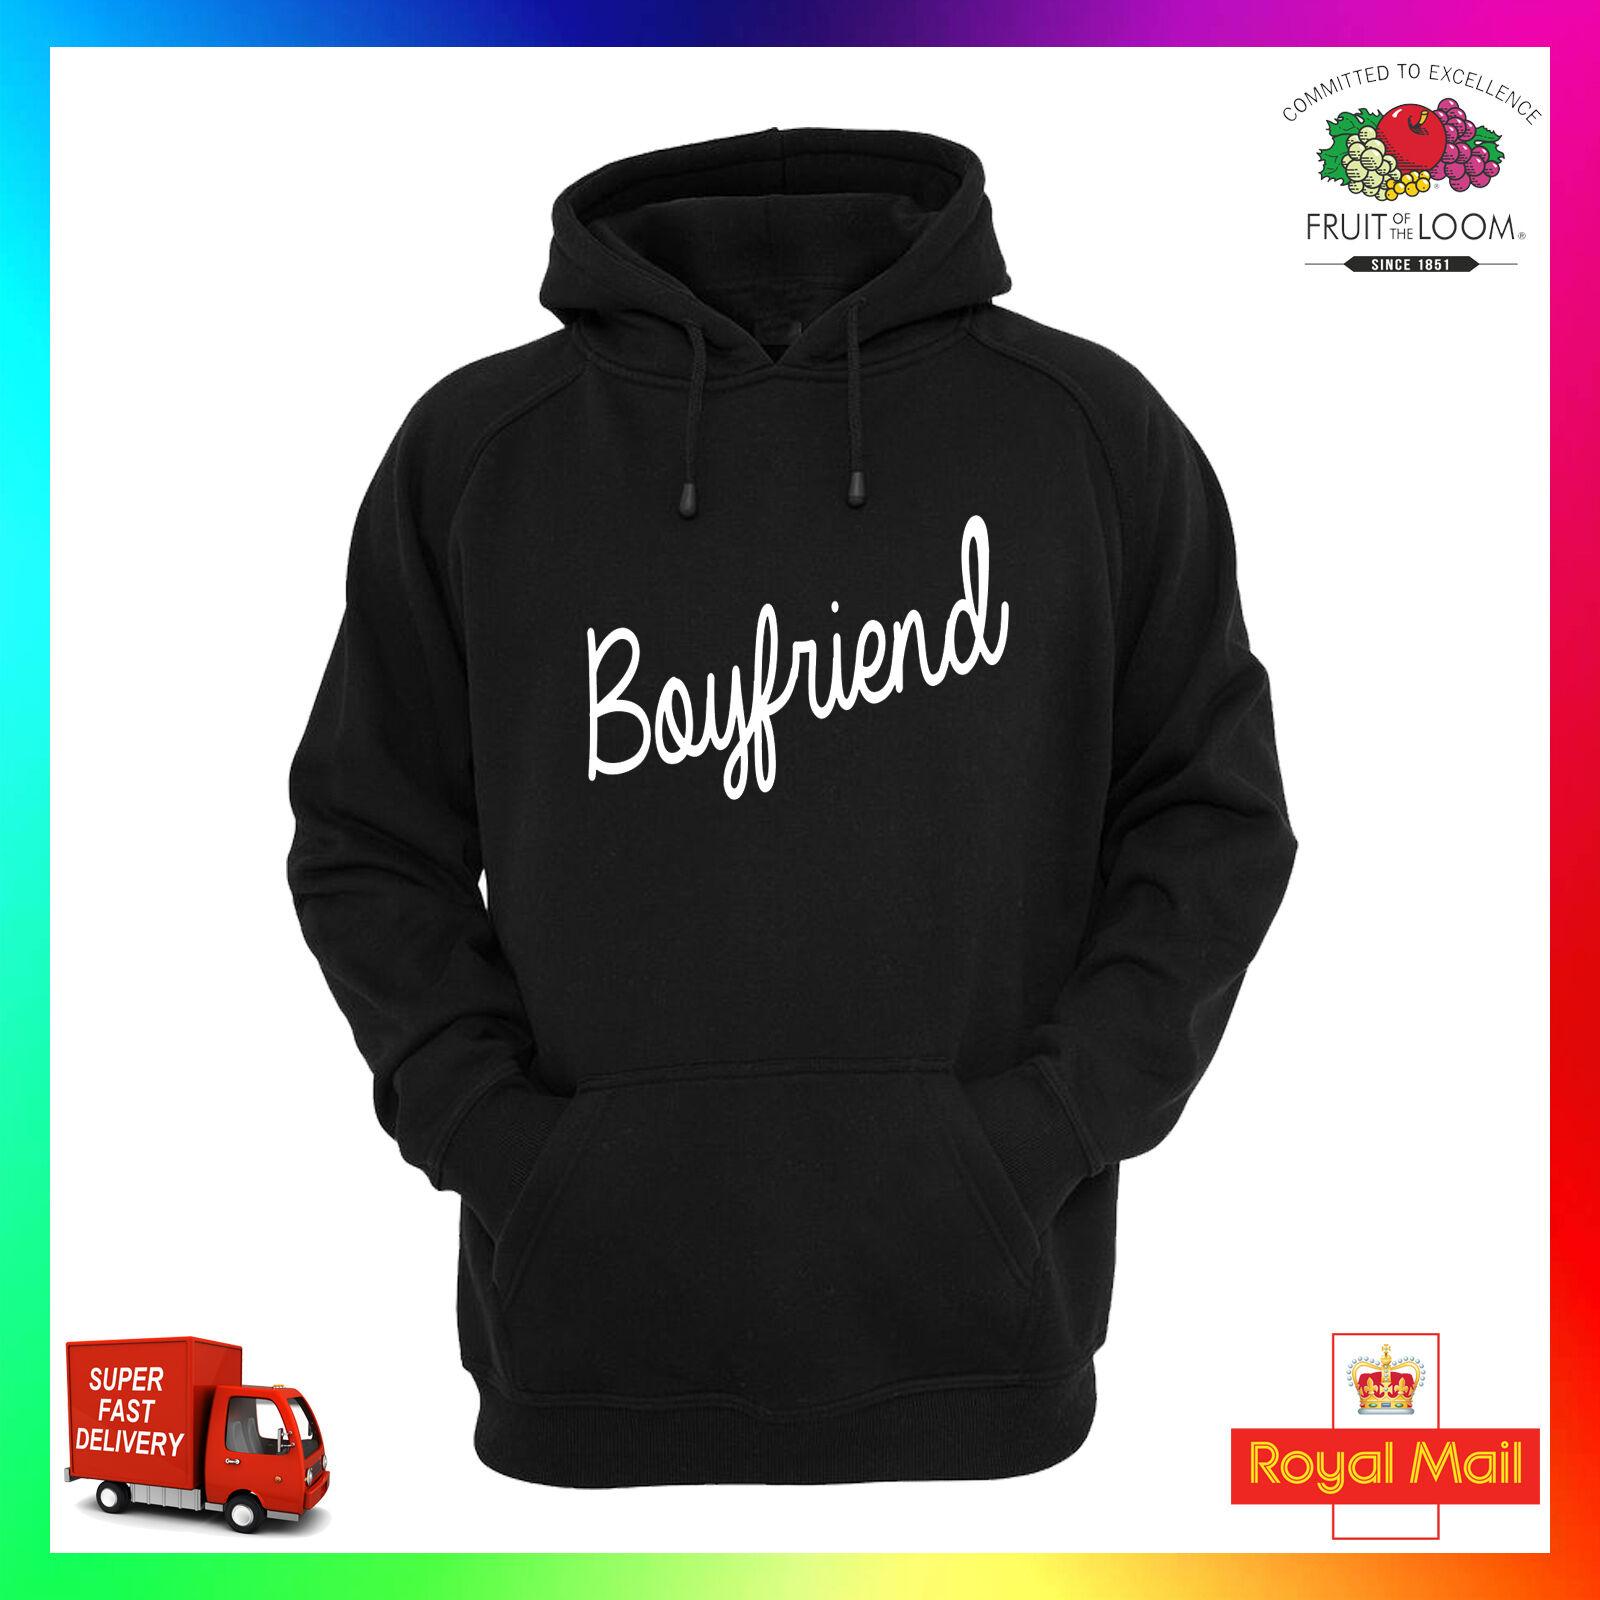 0e14dc20 Boyfriend BF Hoodie Hoody Funny Parody Trend Cool Cute Gift Fleek Hype Swag  npyxez1835-Hoodies & Sweatshirts